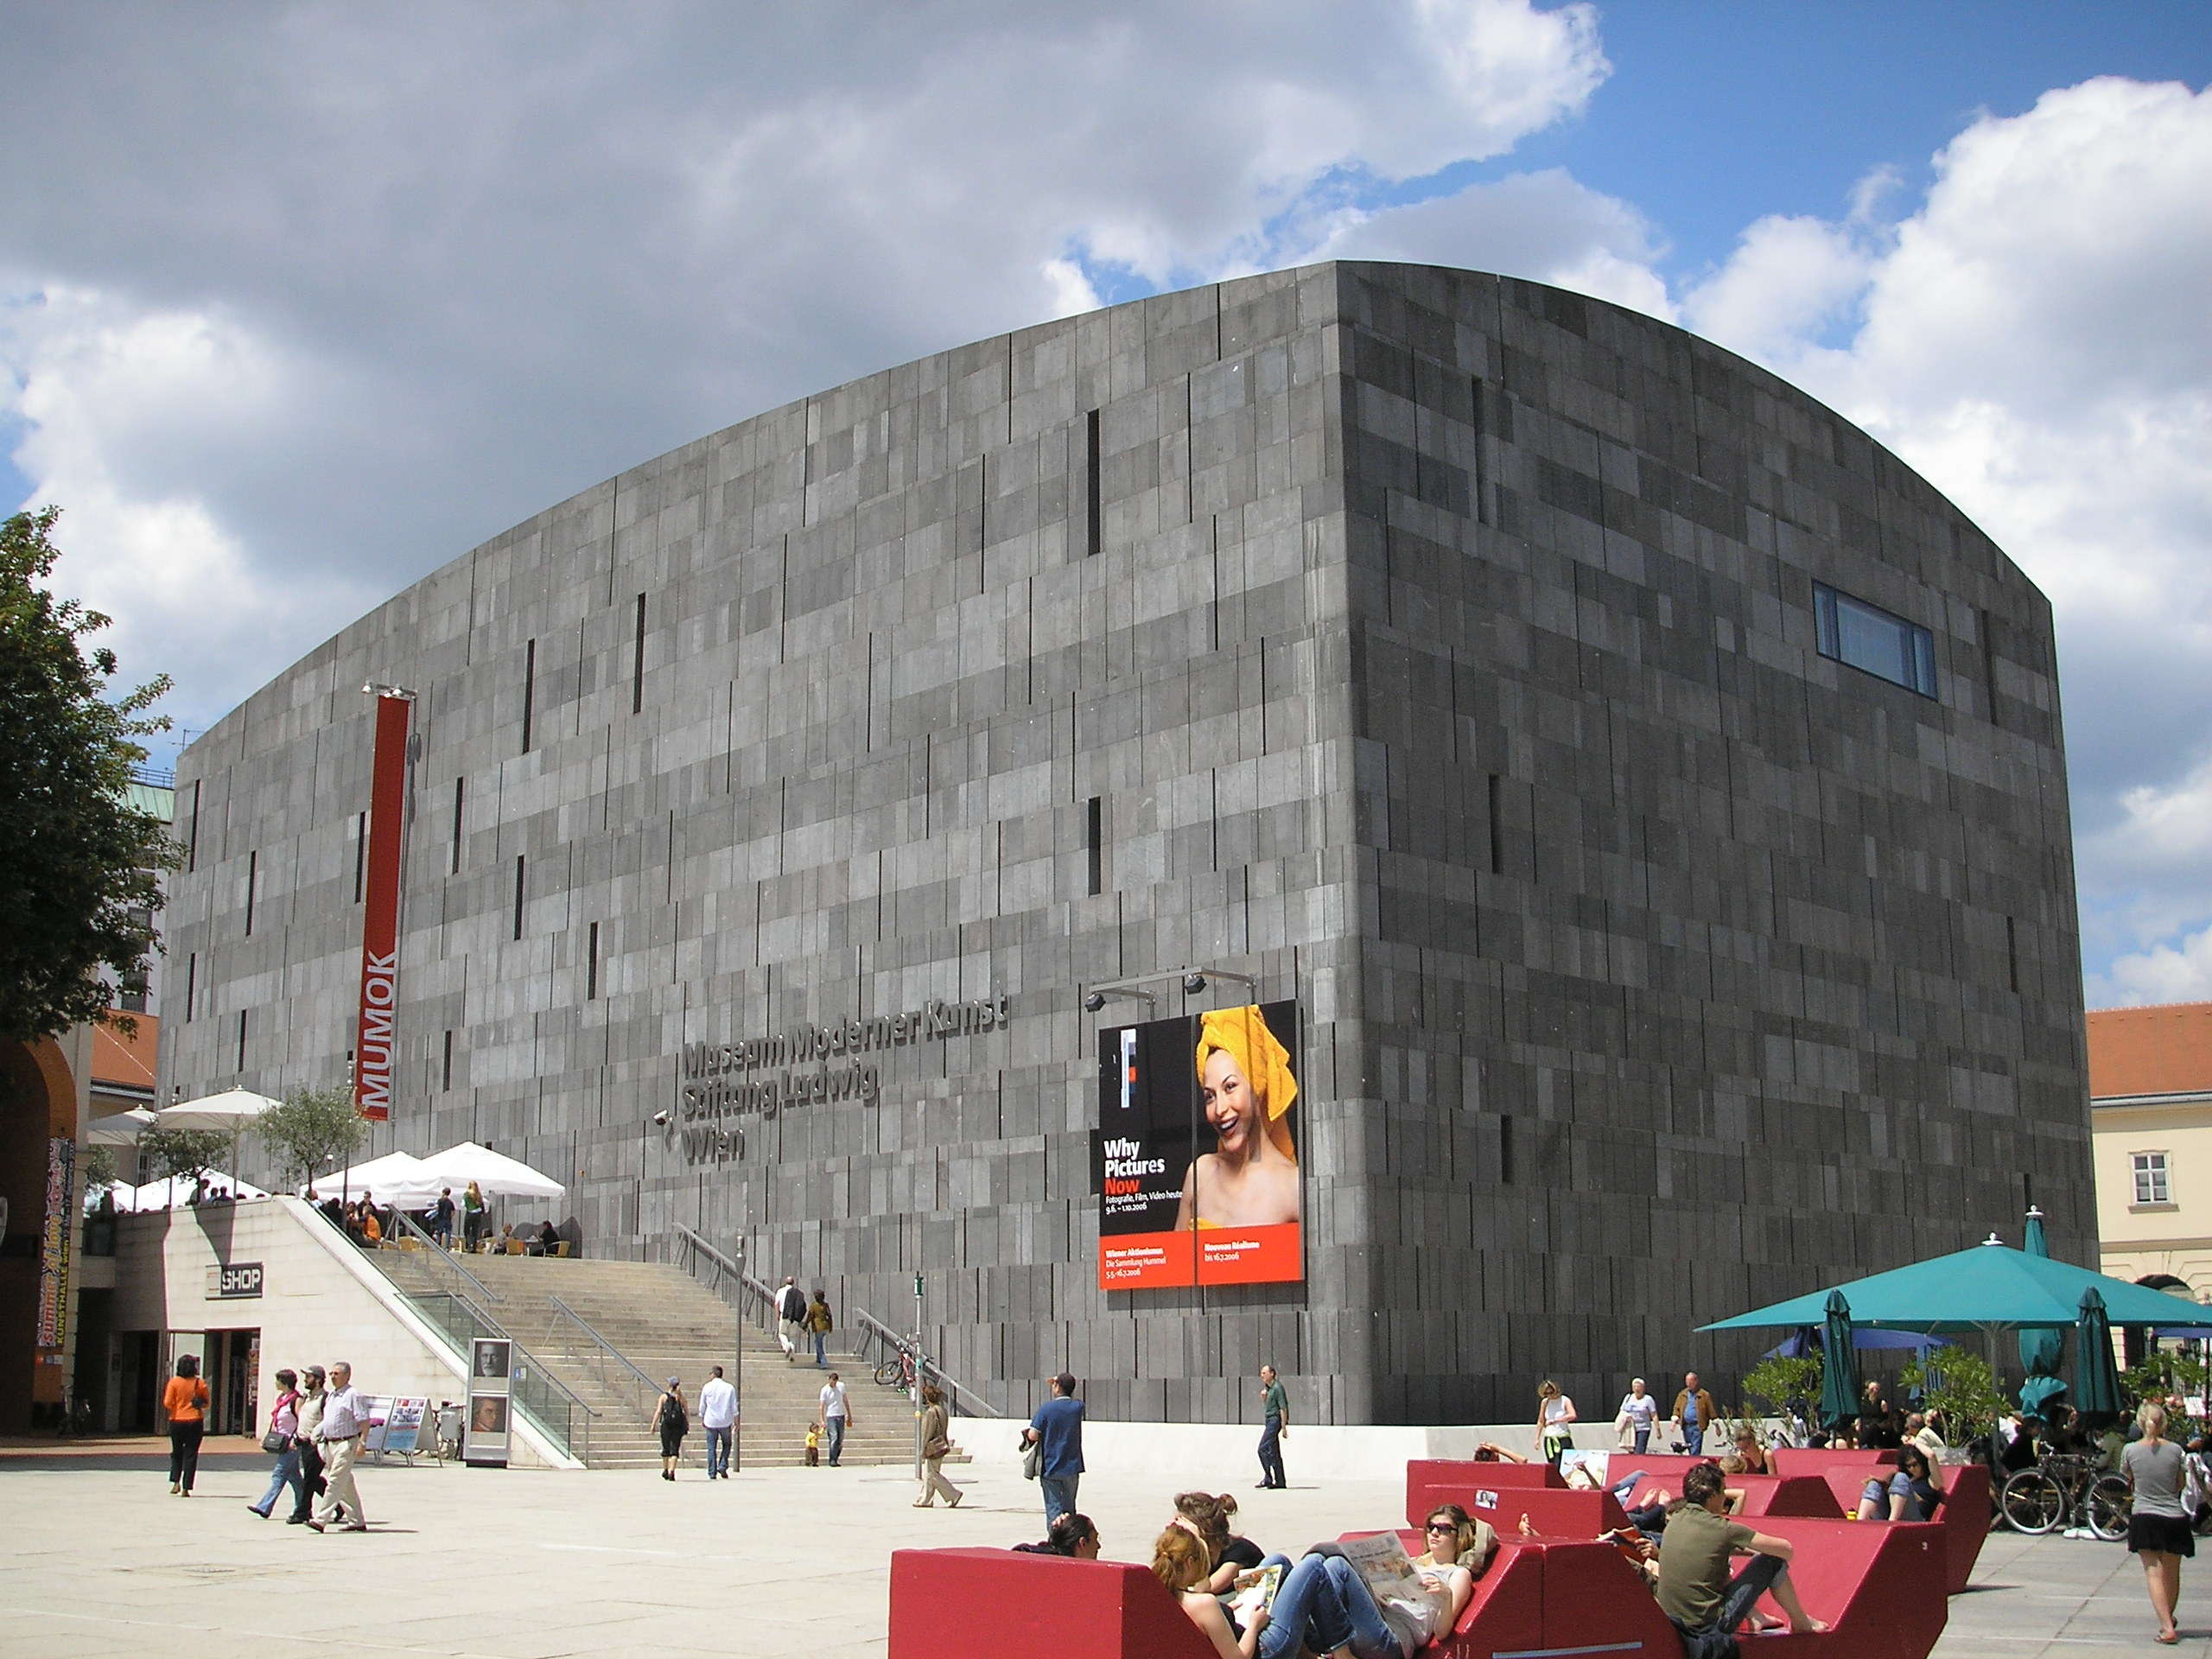 Mumok (Museum of Modern Art)